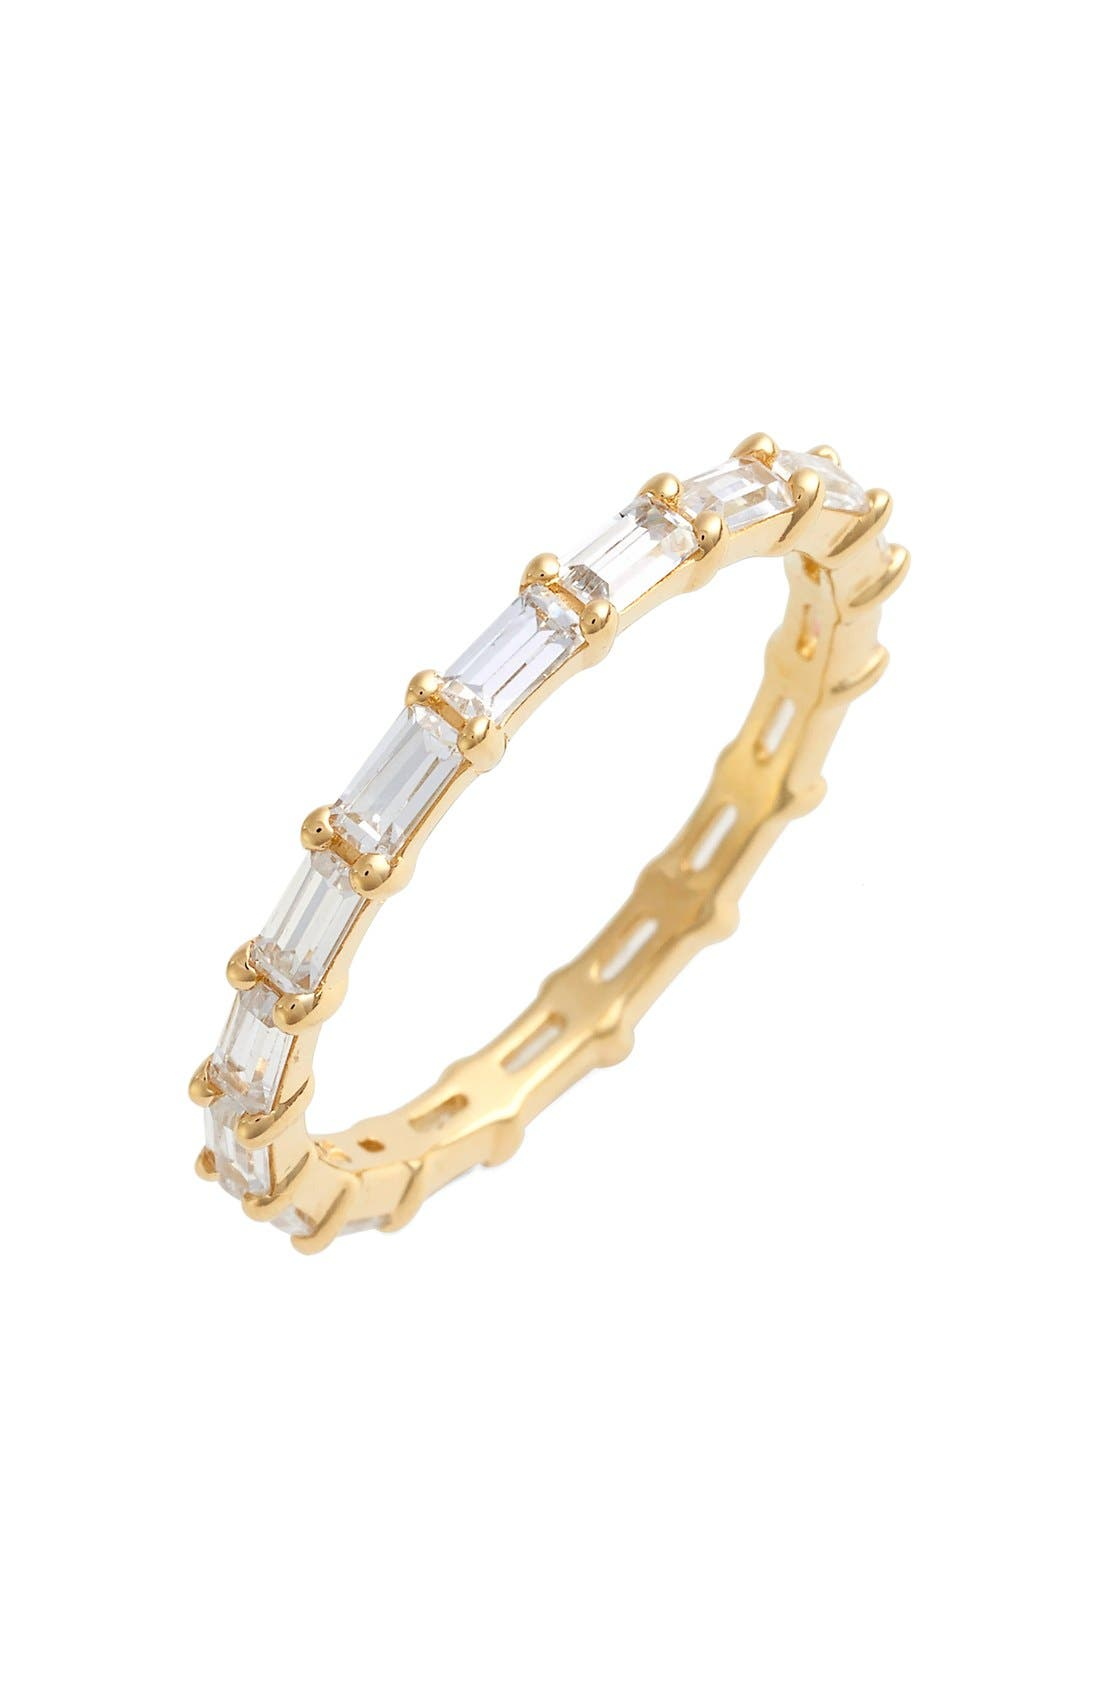 Stackable Cubic Zirconia Baguette Ring,                         Main,                         color, GOLD